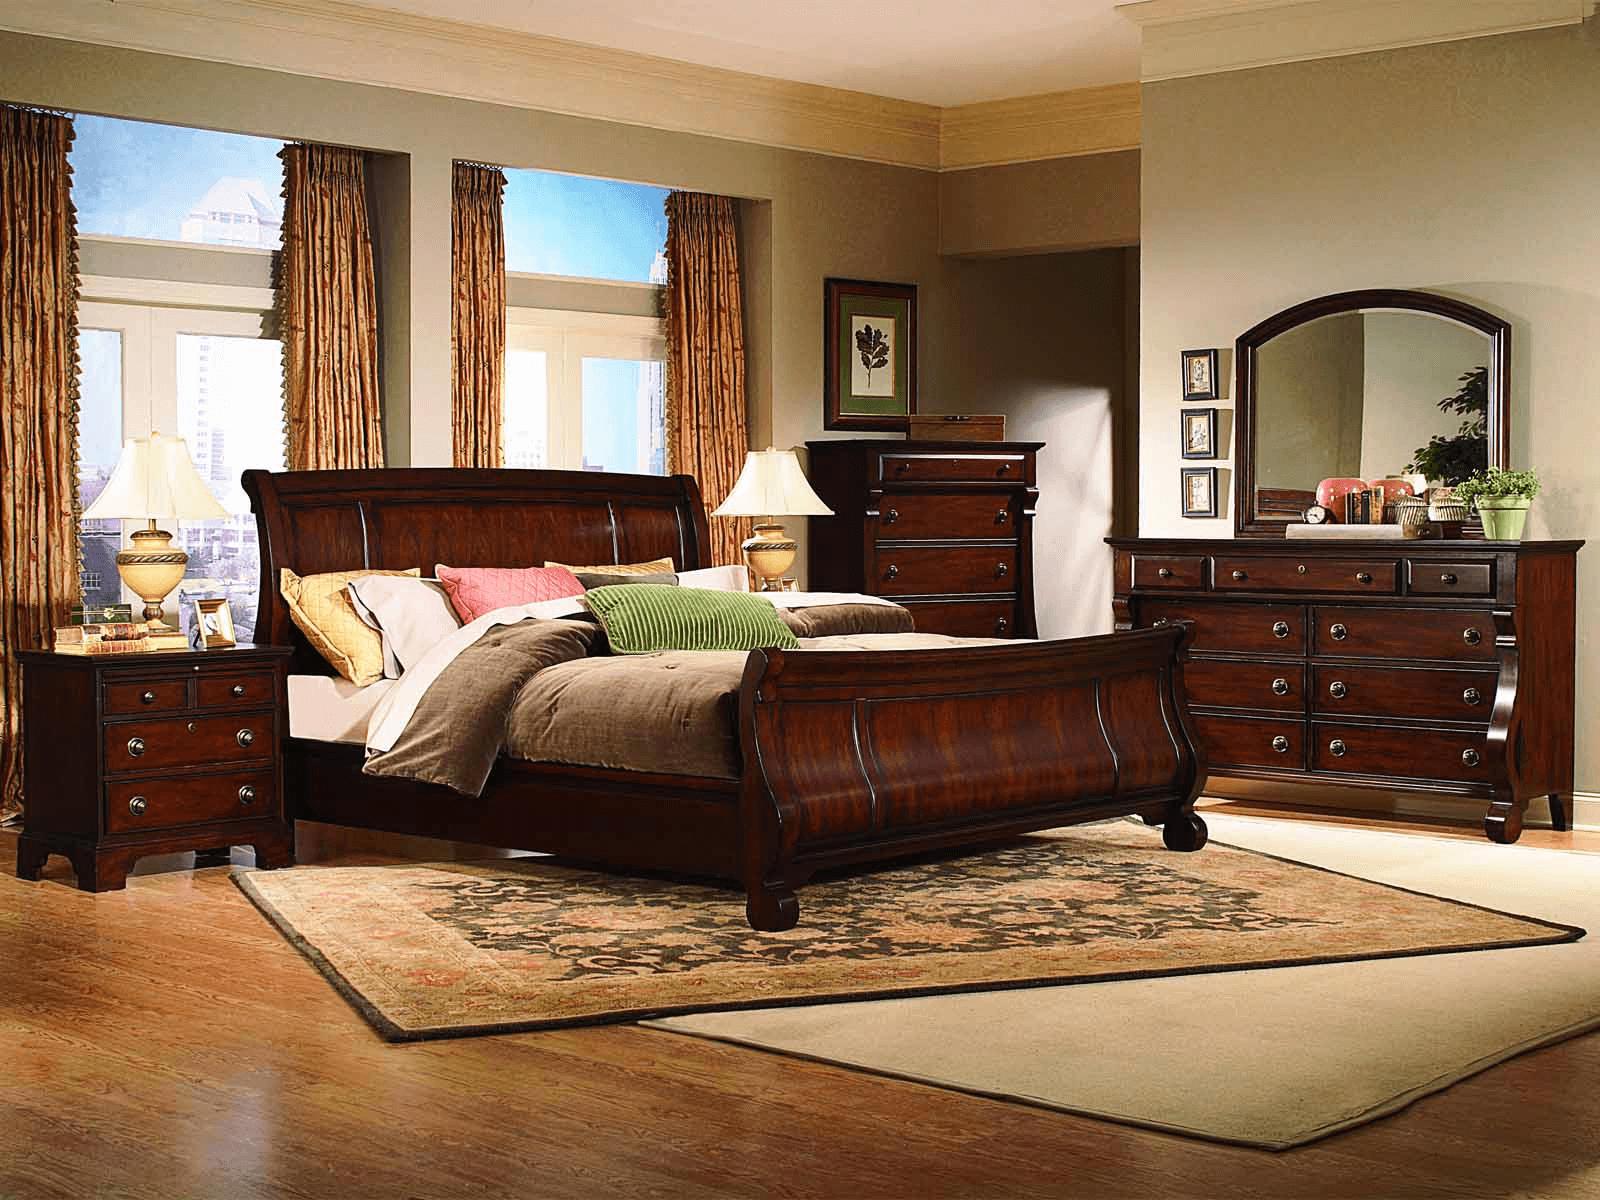 Bedroom with oak furniture